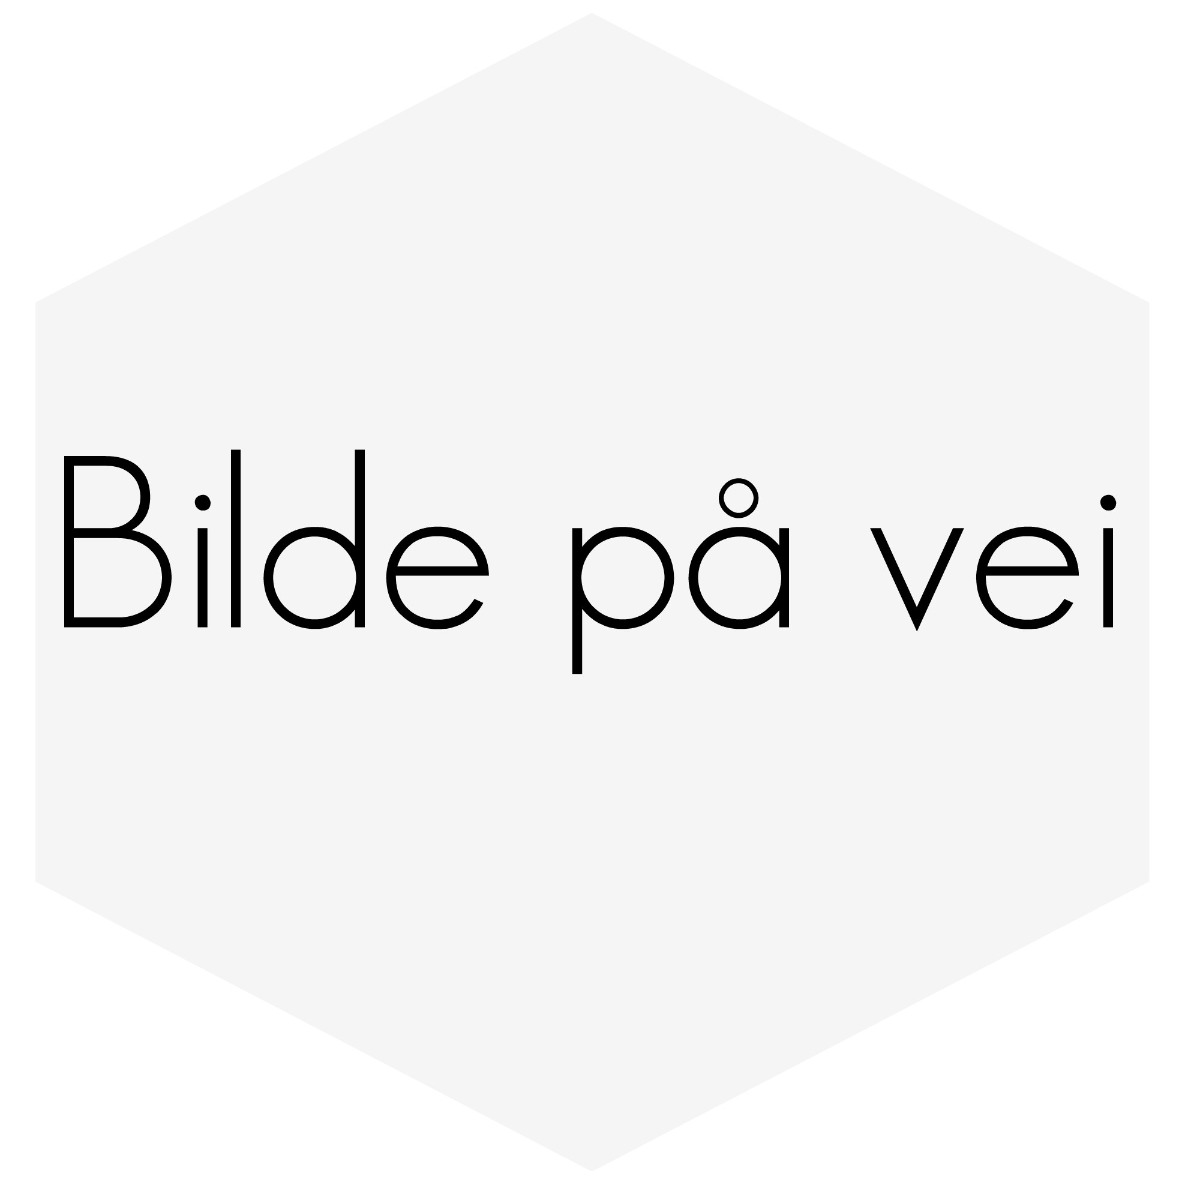 RÅDE/VEIVSTAKE H-PROFIL B230 std LENGDE PRIS PR.STK